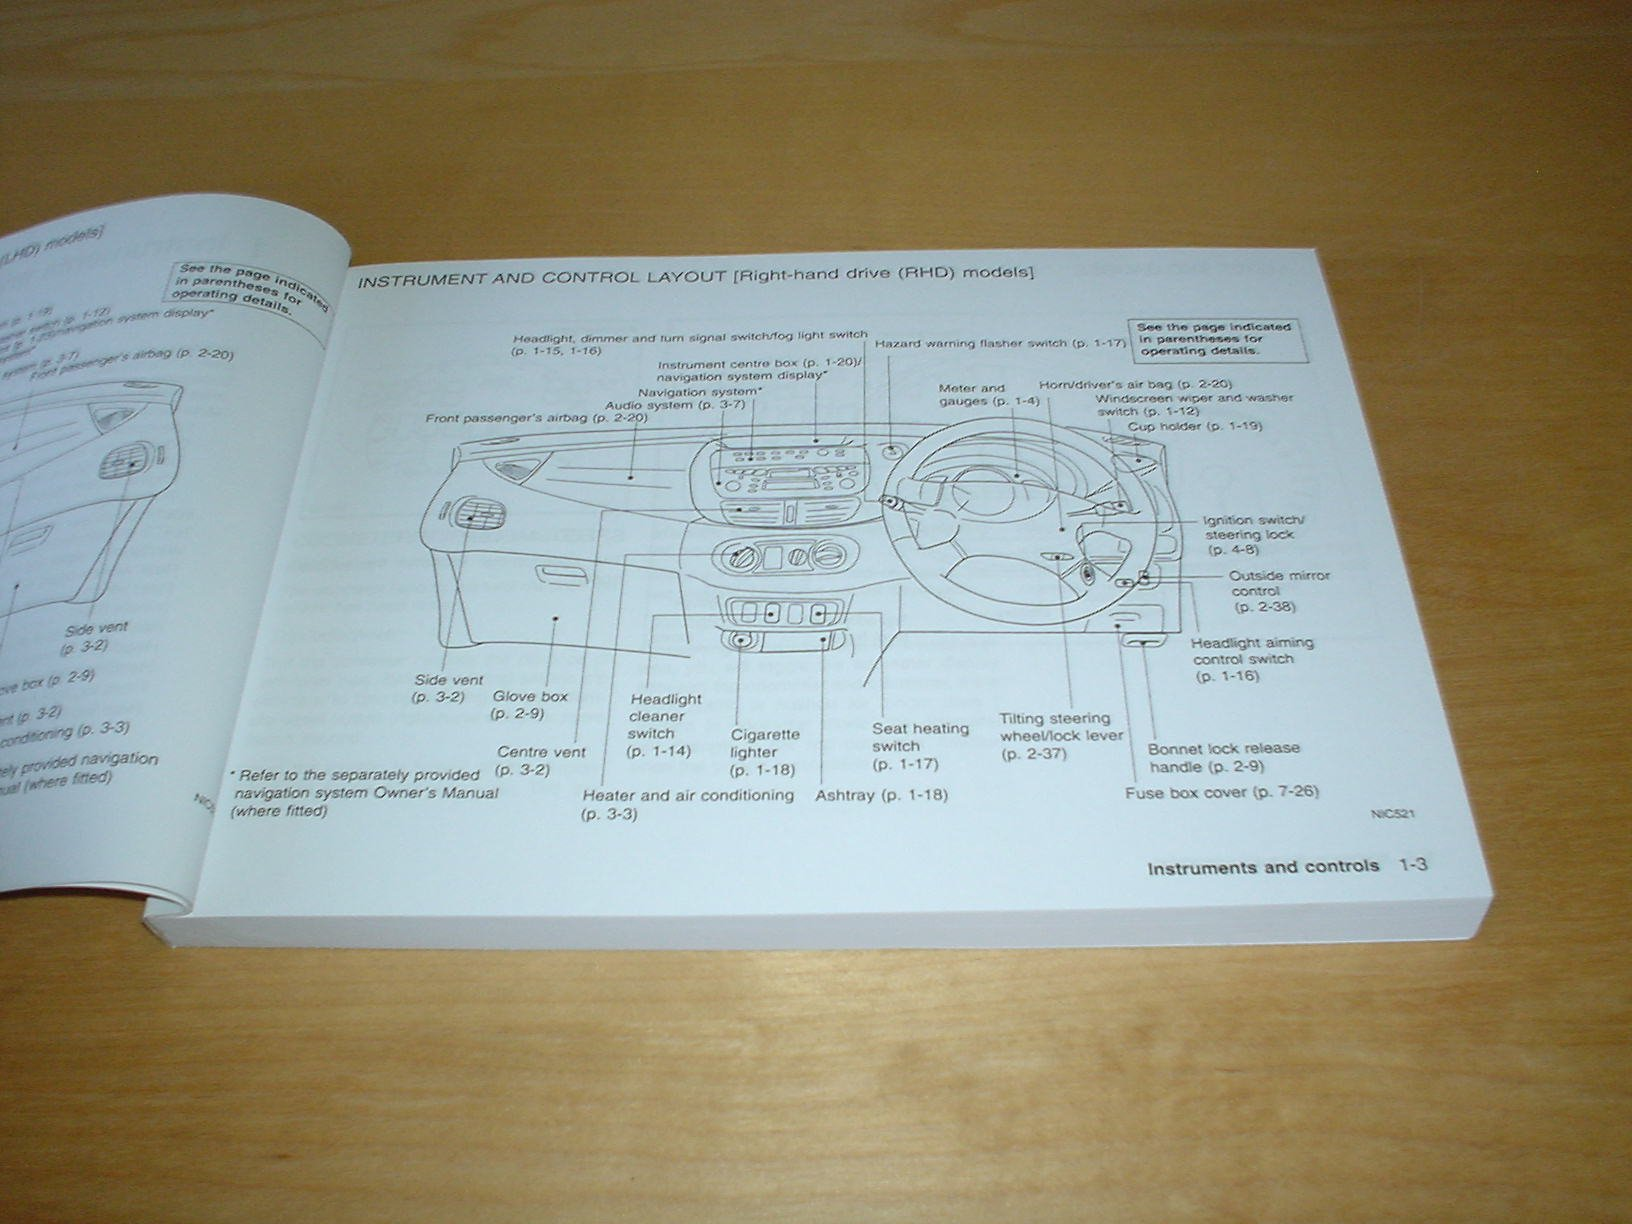 Nissan Almera Tino Owners Manual Handbook 2000 2006 18 20 Fuse Box In Litre Petrol Engine 22 Ddti Diesel Hand Book